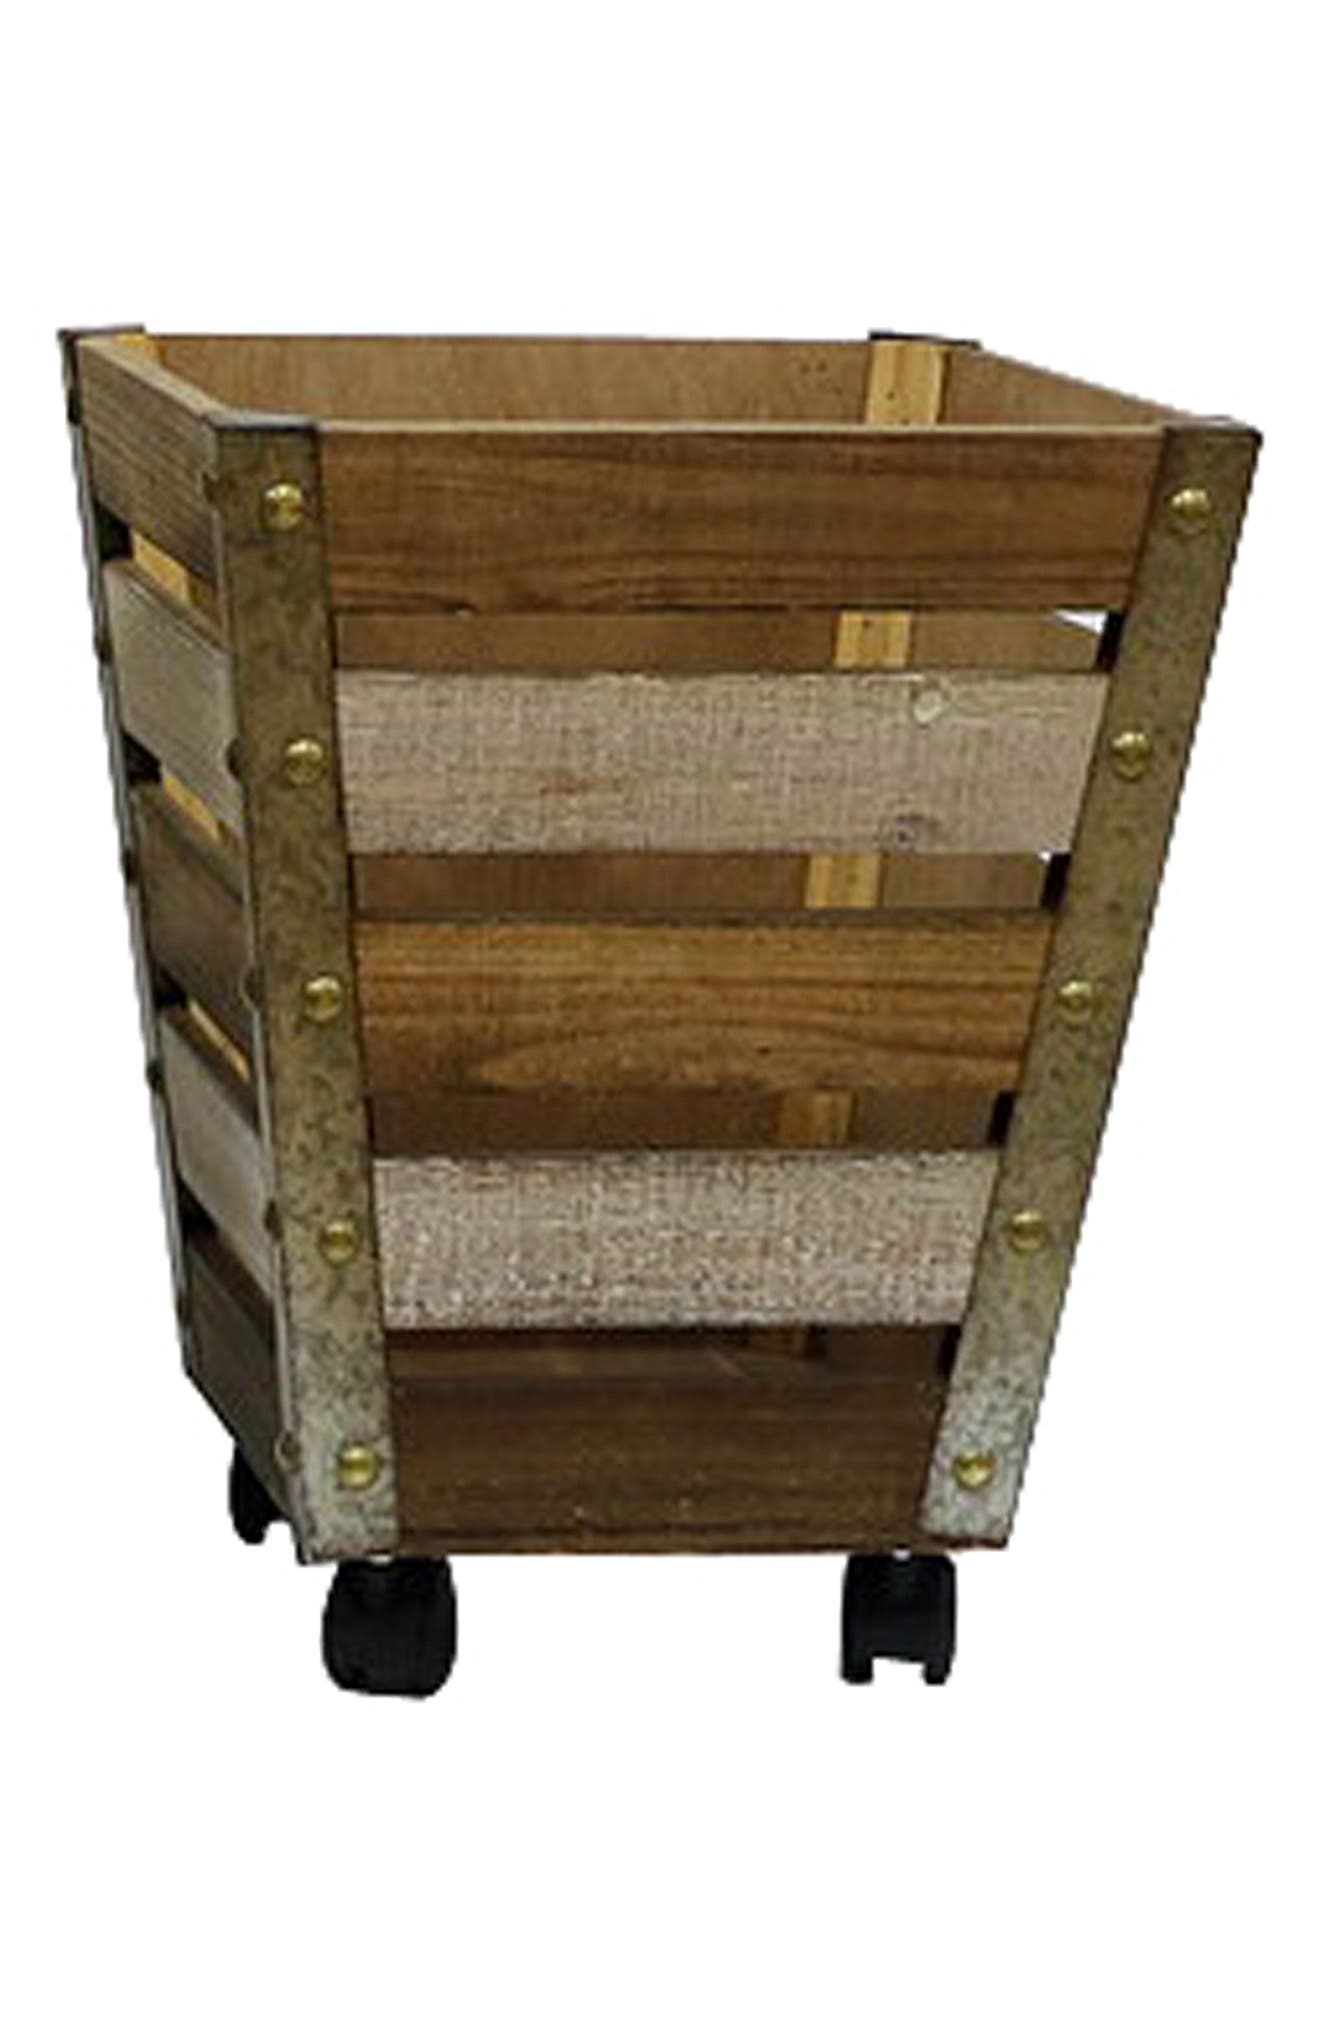 Alternate Image 1 Selected - Crystal Art Gallery Wheeled Wooden Basket